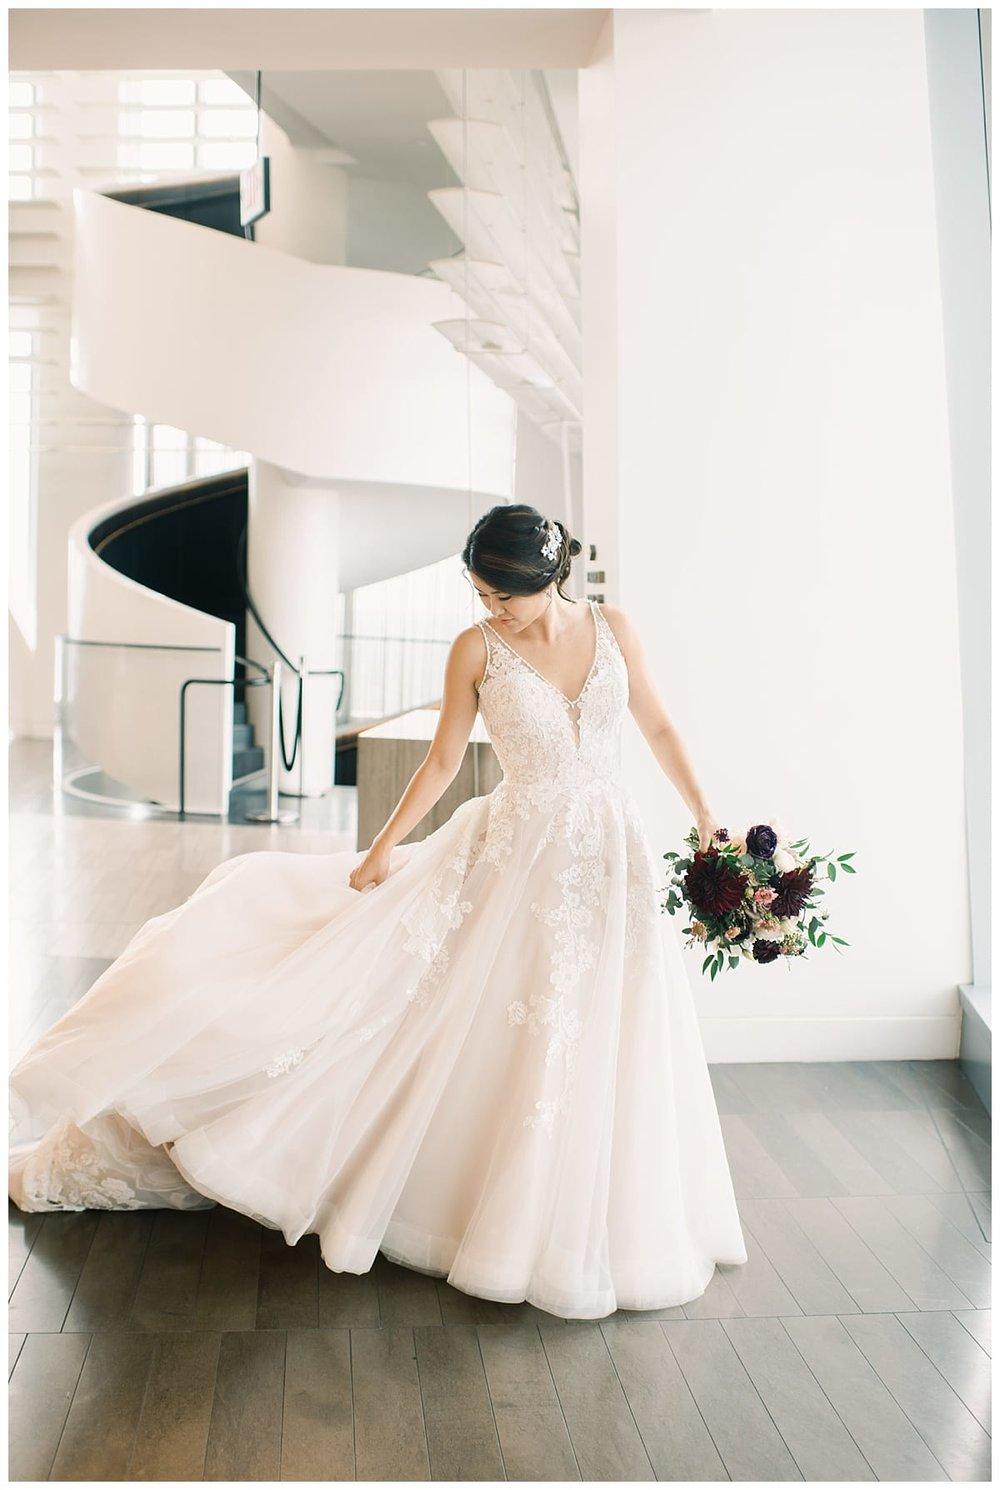 Intercontinental-Los-Angeles-Wedding-Carissa-Woo-Photography_0005.jpg